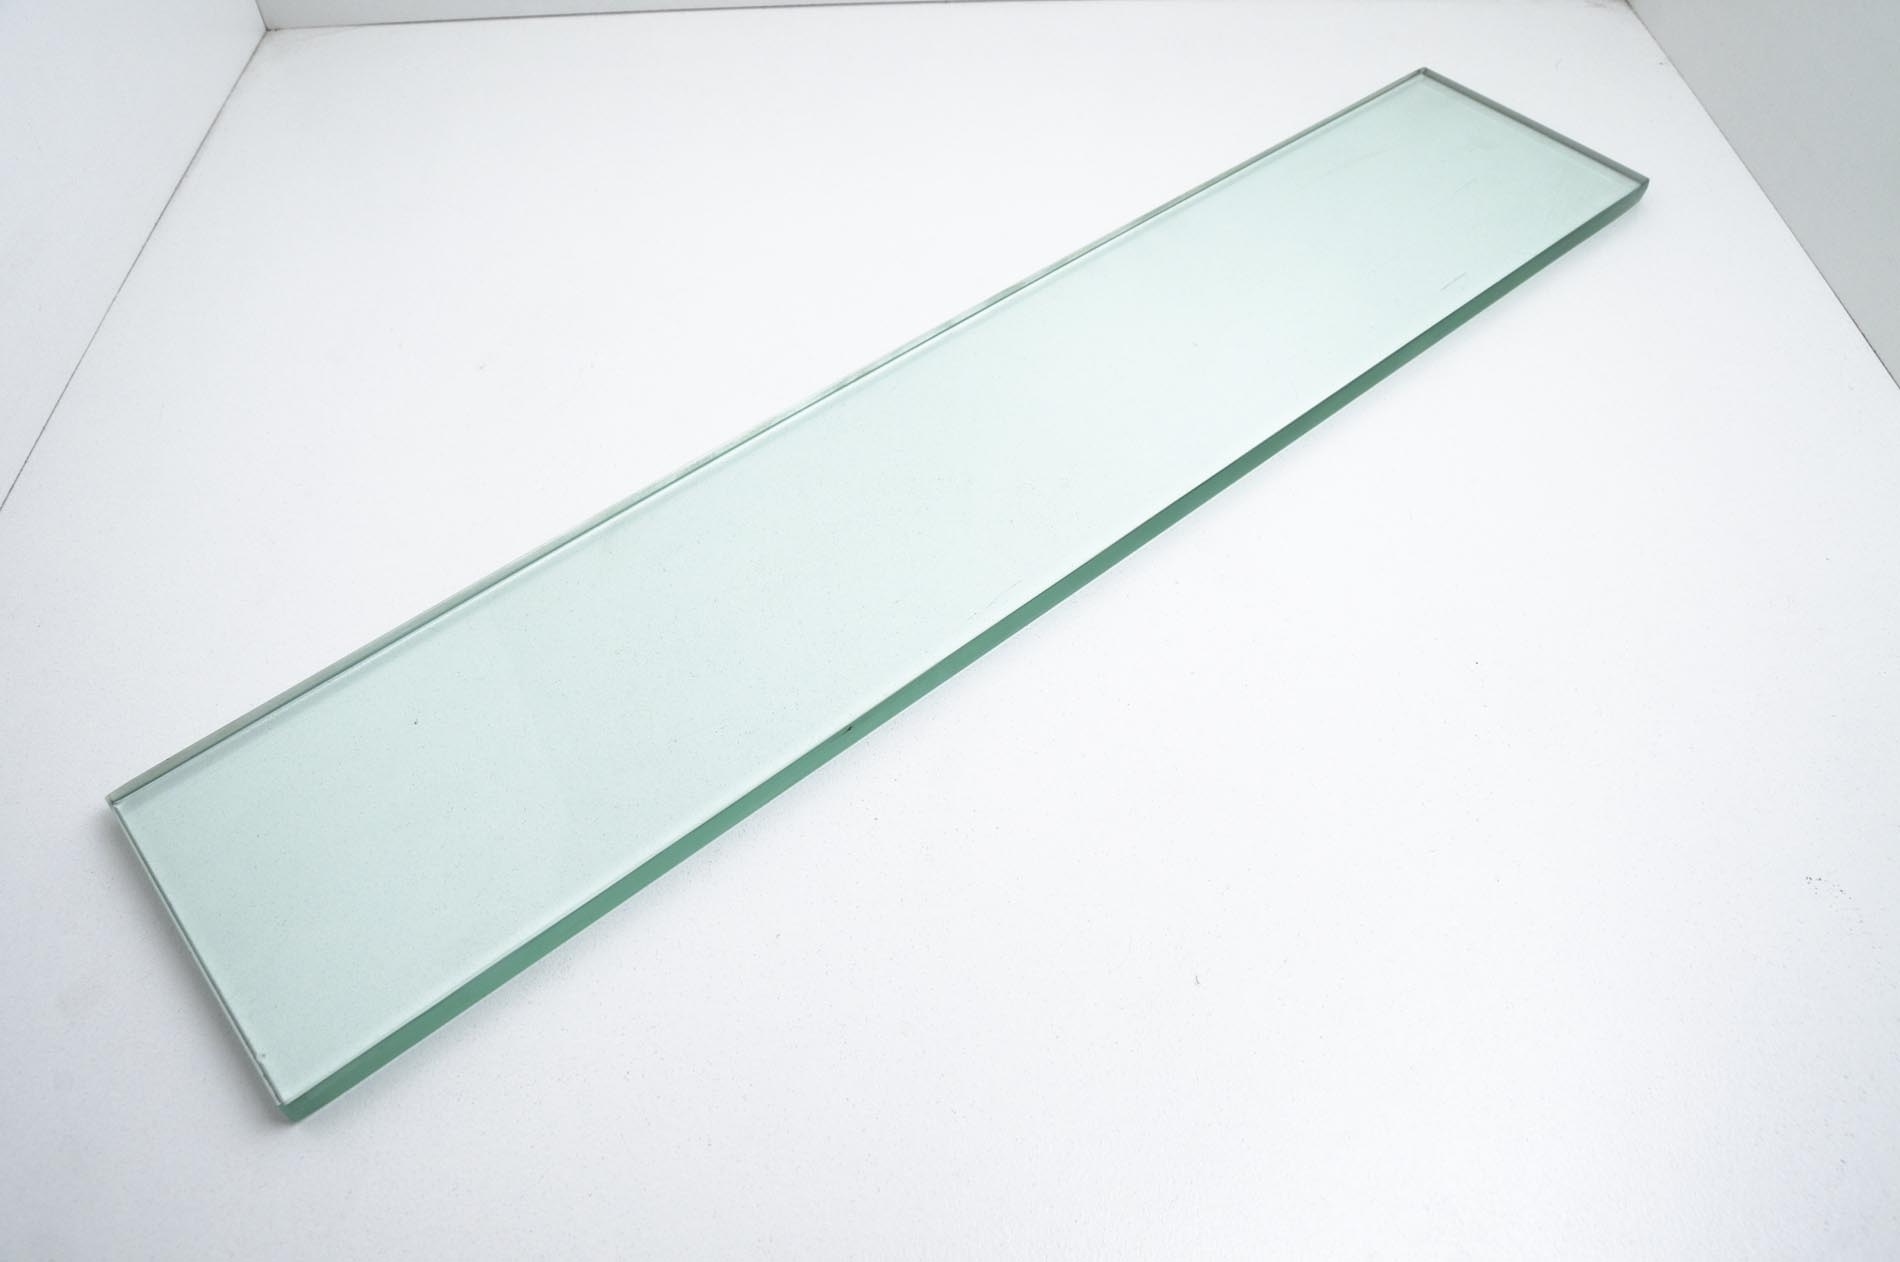 GUB0002-Base para aplanar pie cepillos vidrio 500x100x10 GUB0002-max-1.